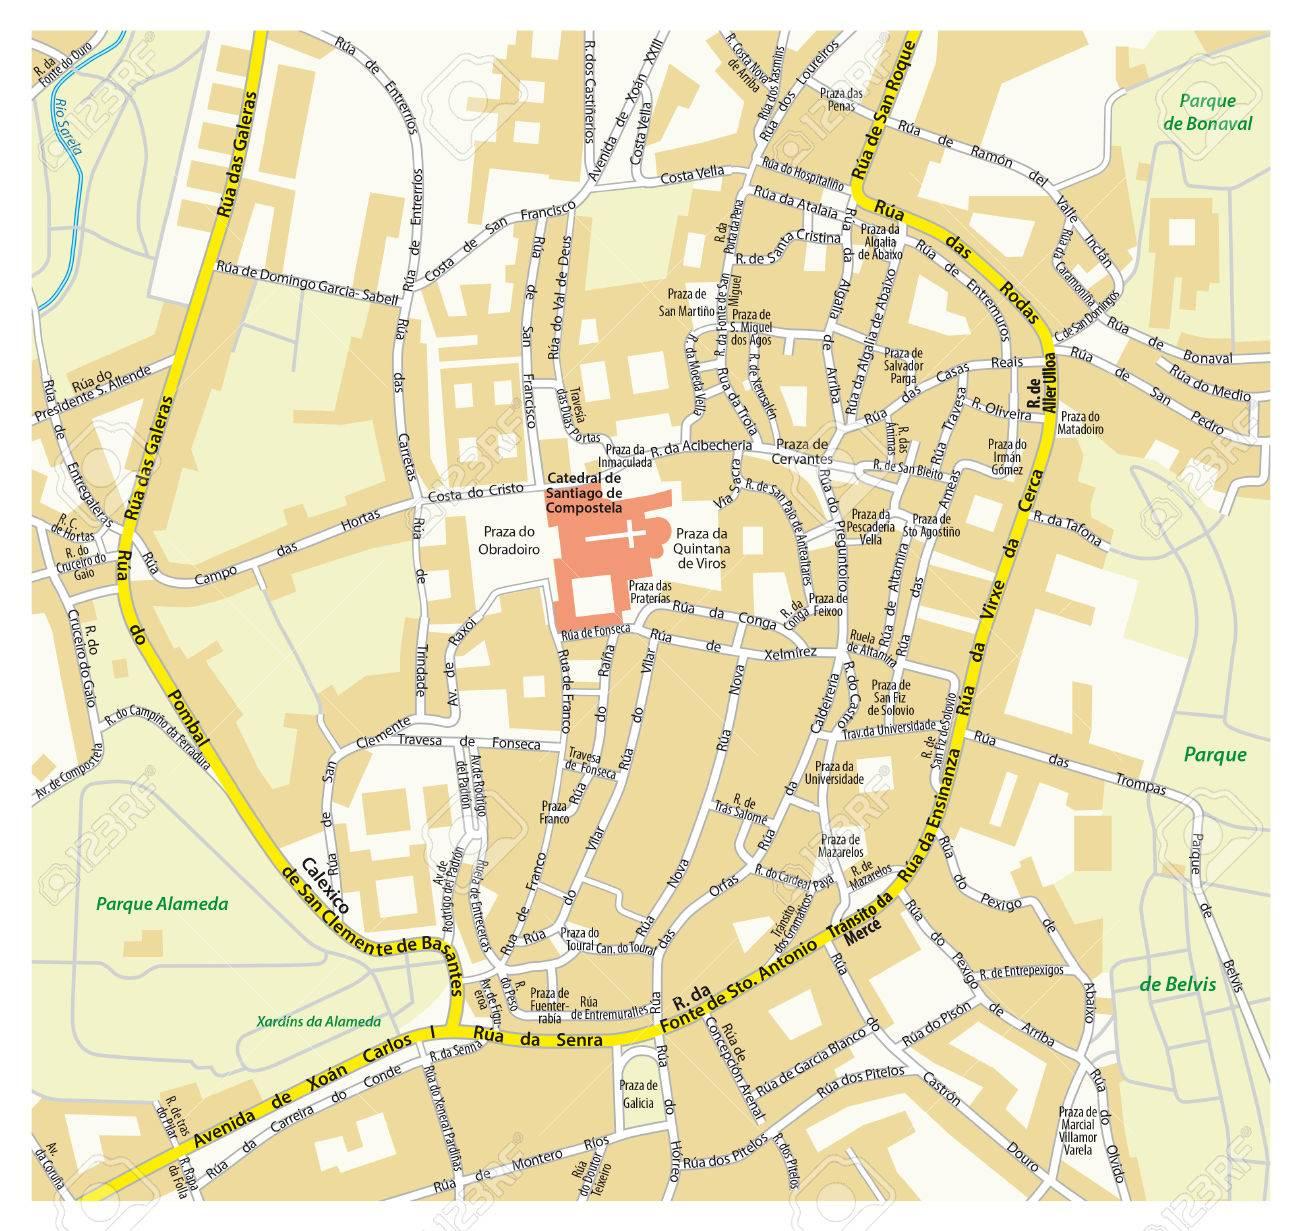 Downtown Map The Galician Capital Of Santiago De Compostela